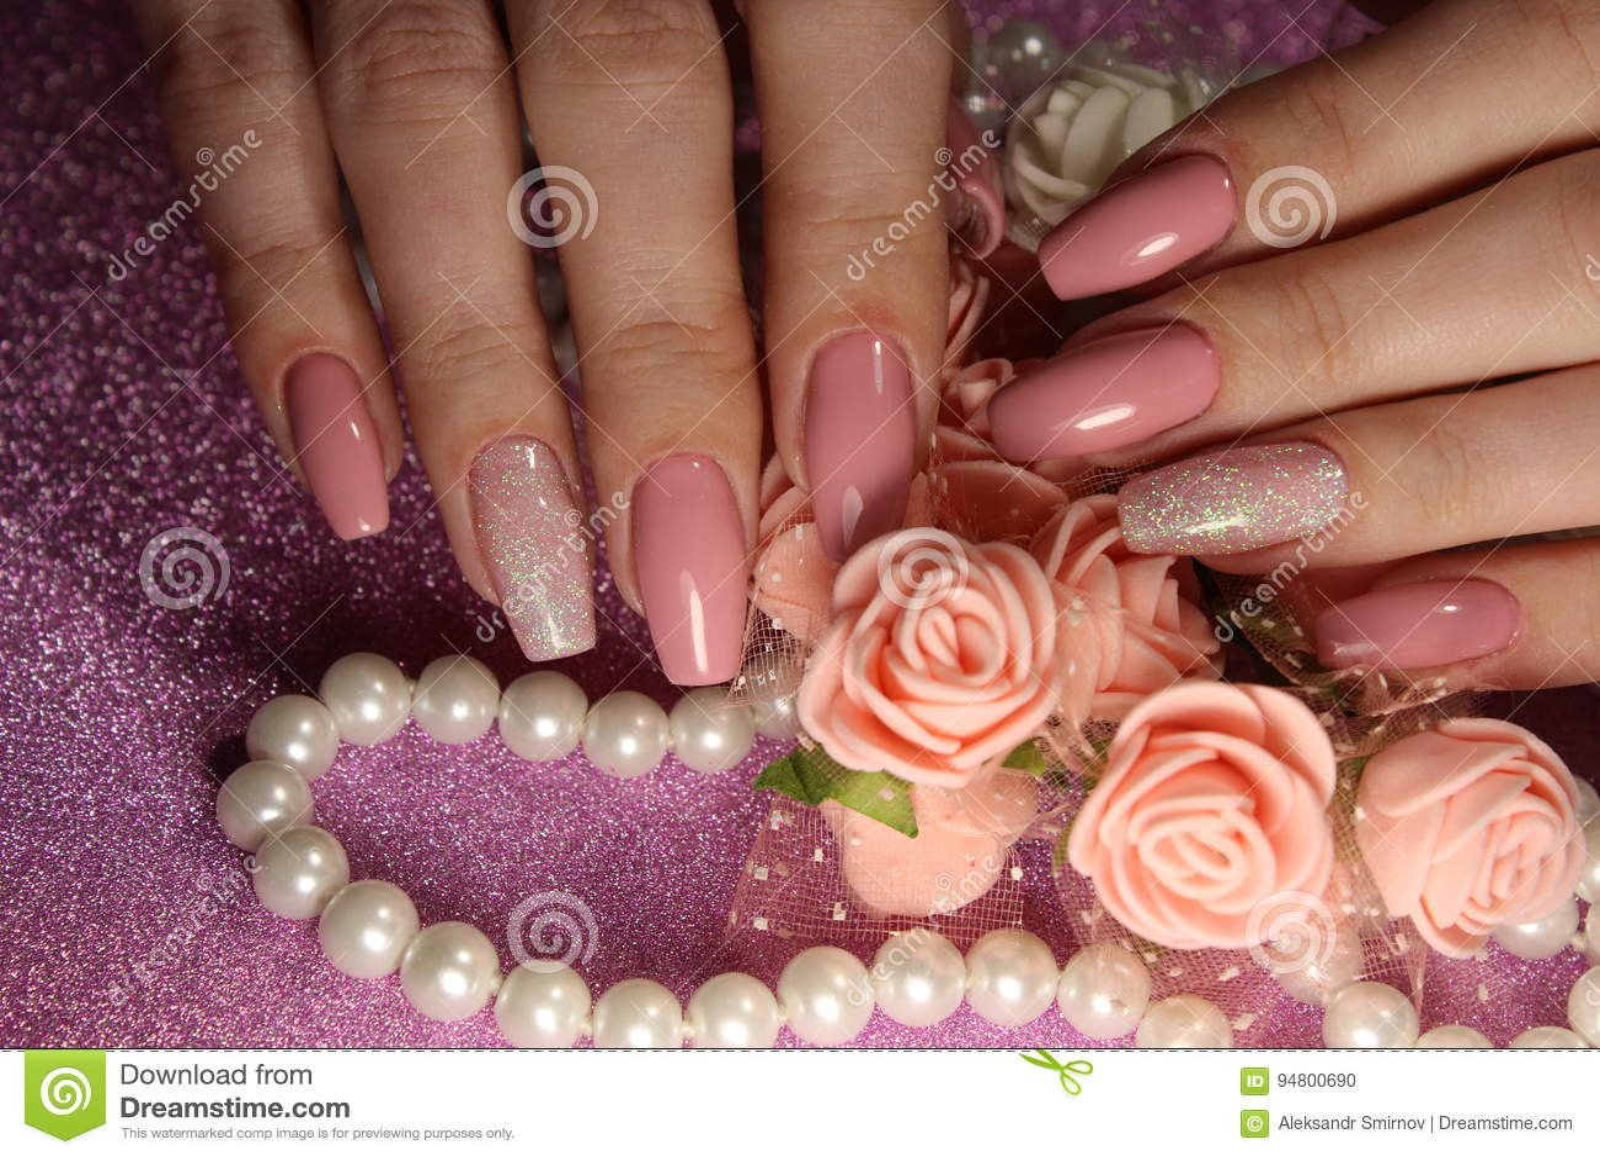 Elegant Manicure Design In Cream Color Stock Photo - Image of woman ...